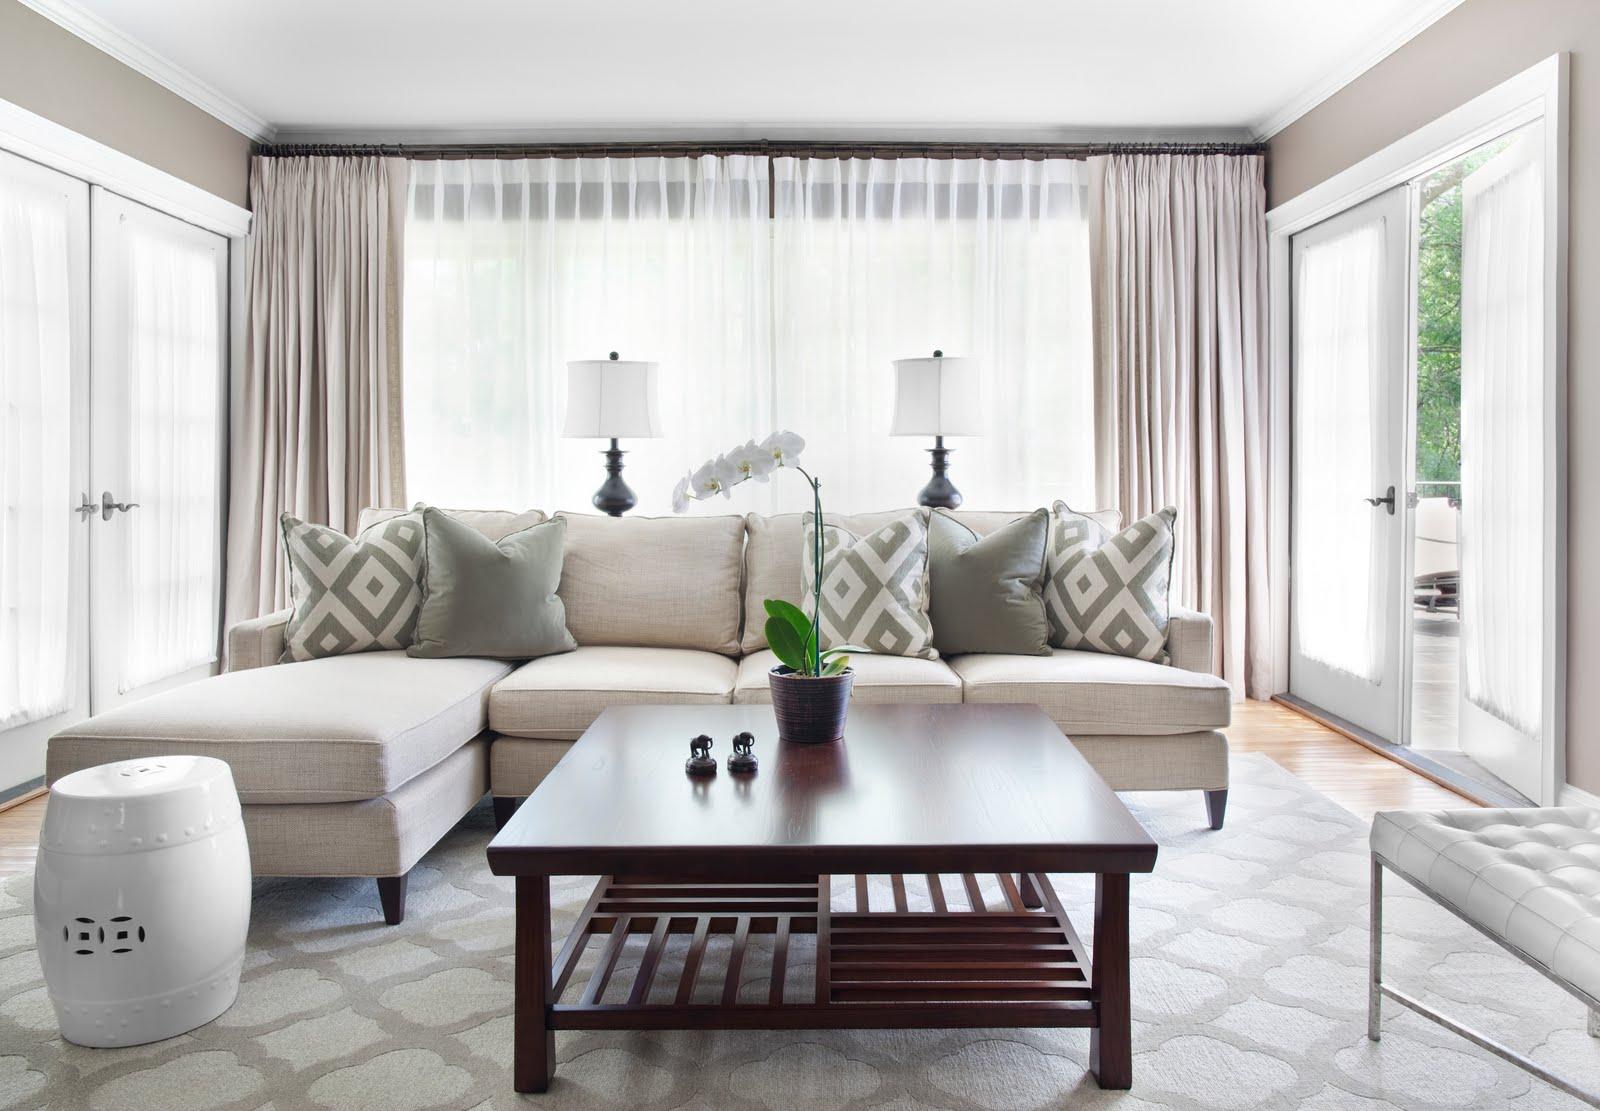 Light Furniture For Living Room 17 Best Images About Livingroom On Pinterest Modern Apartments